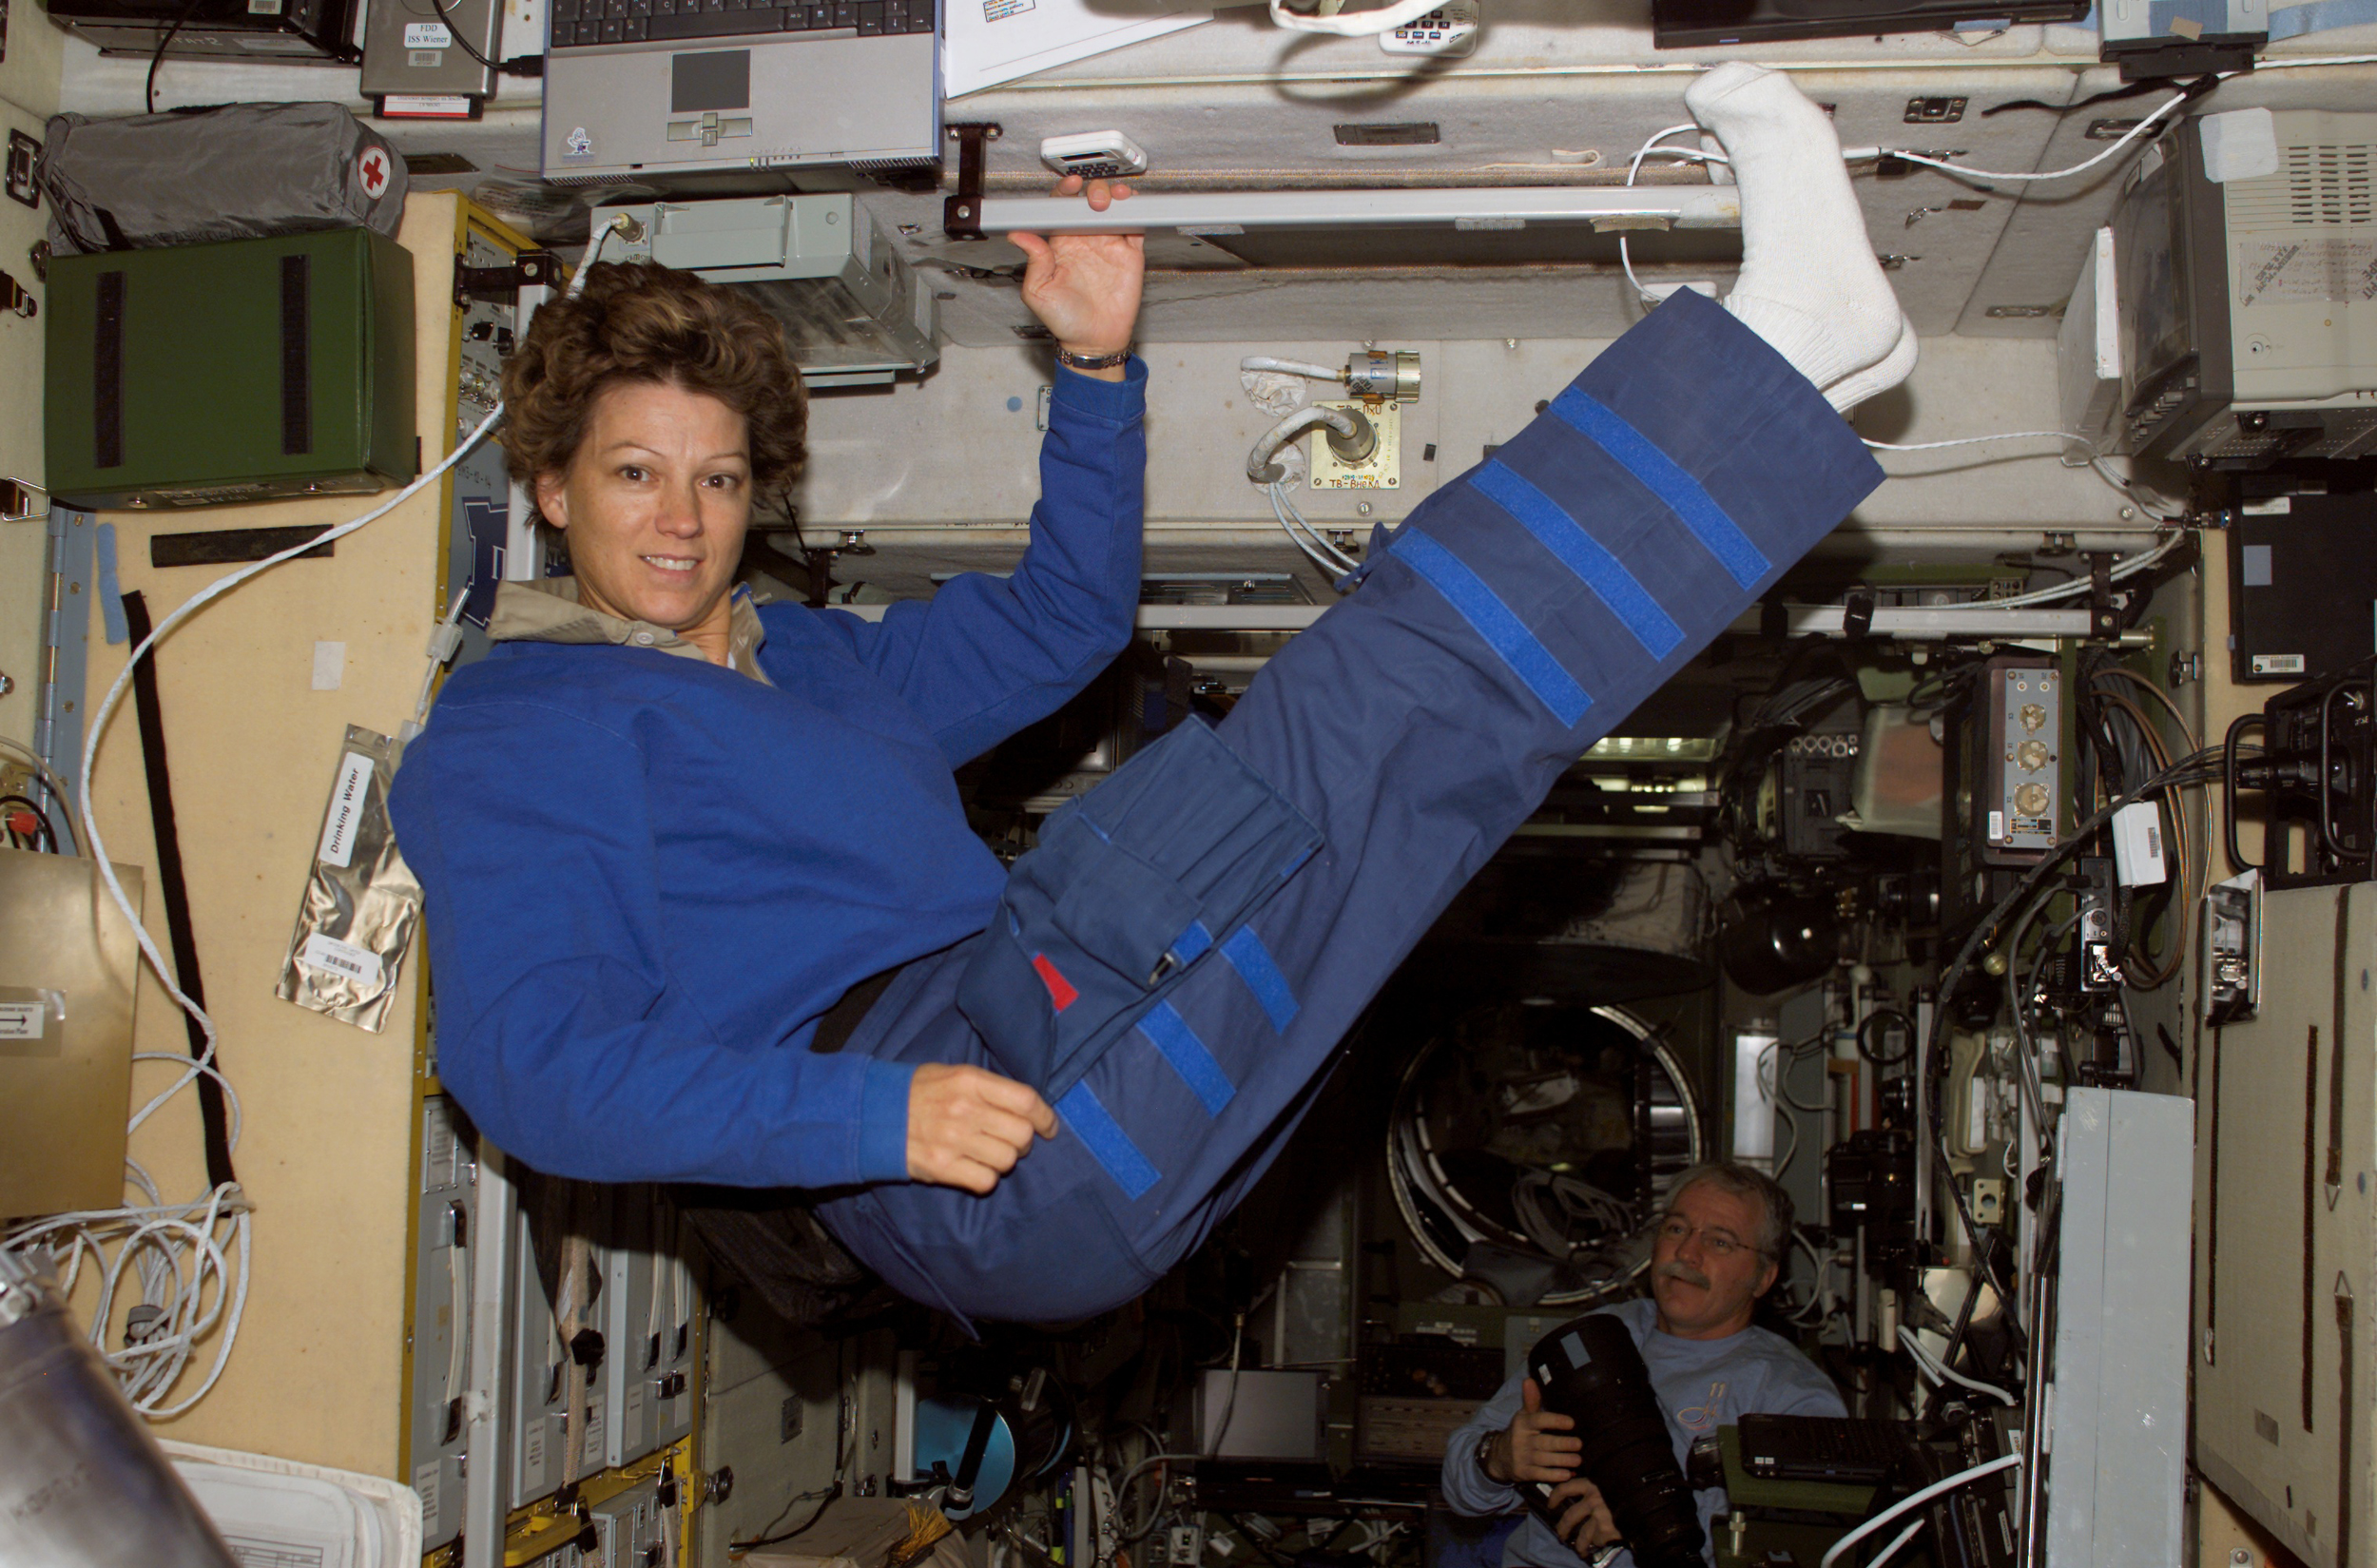 astronaut eileen collins - photo #22